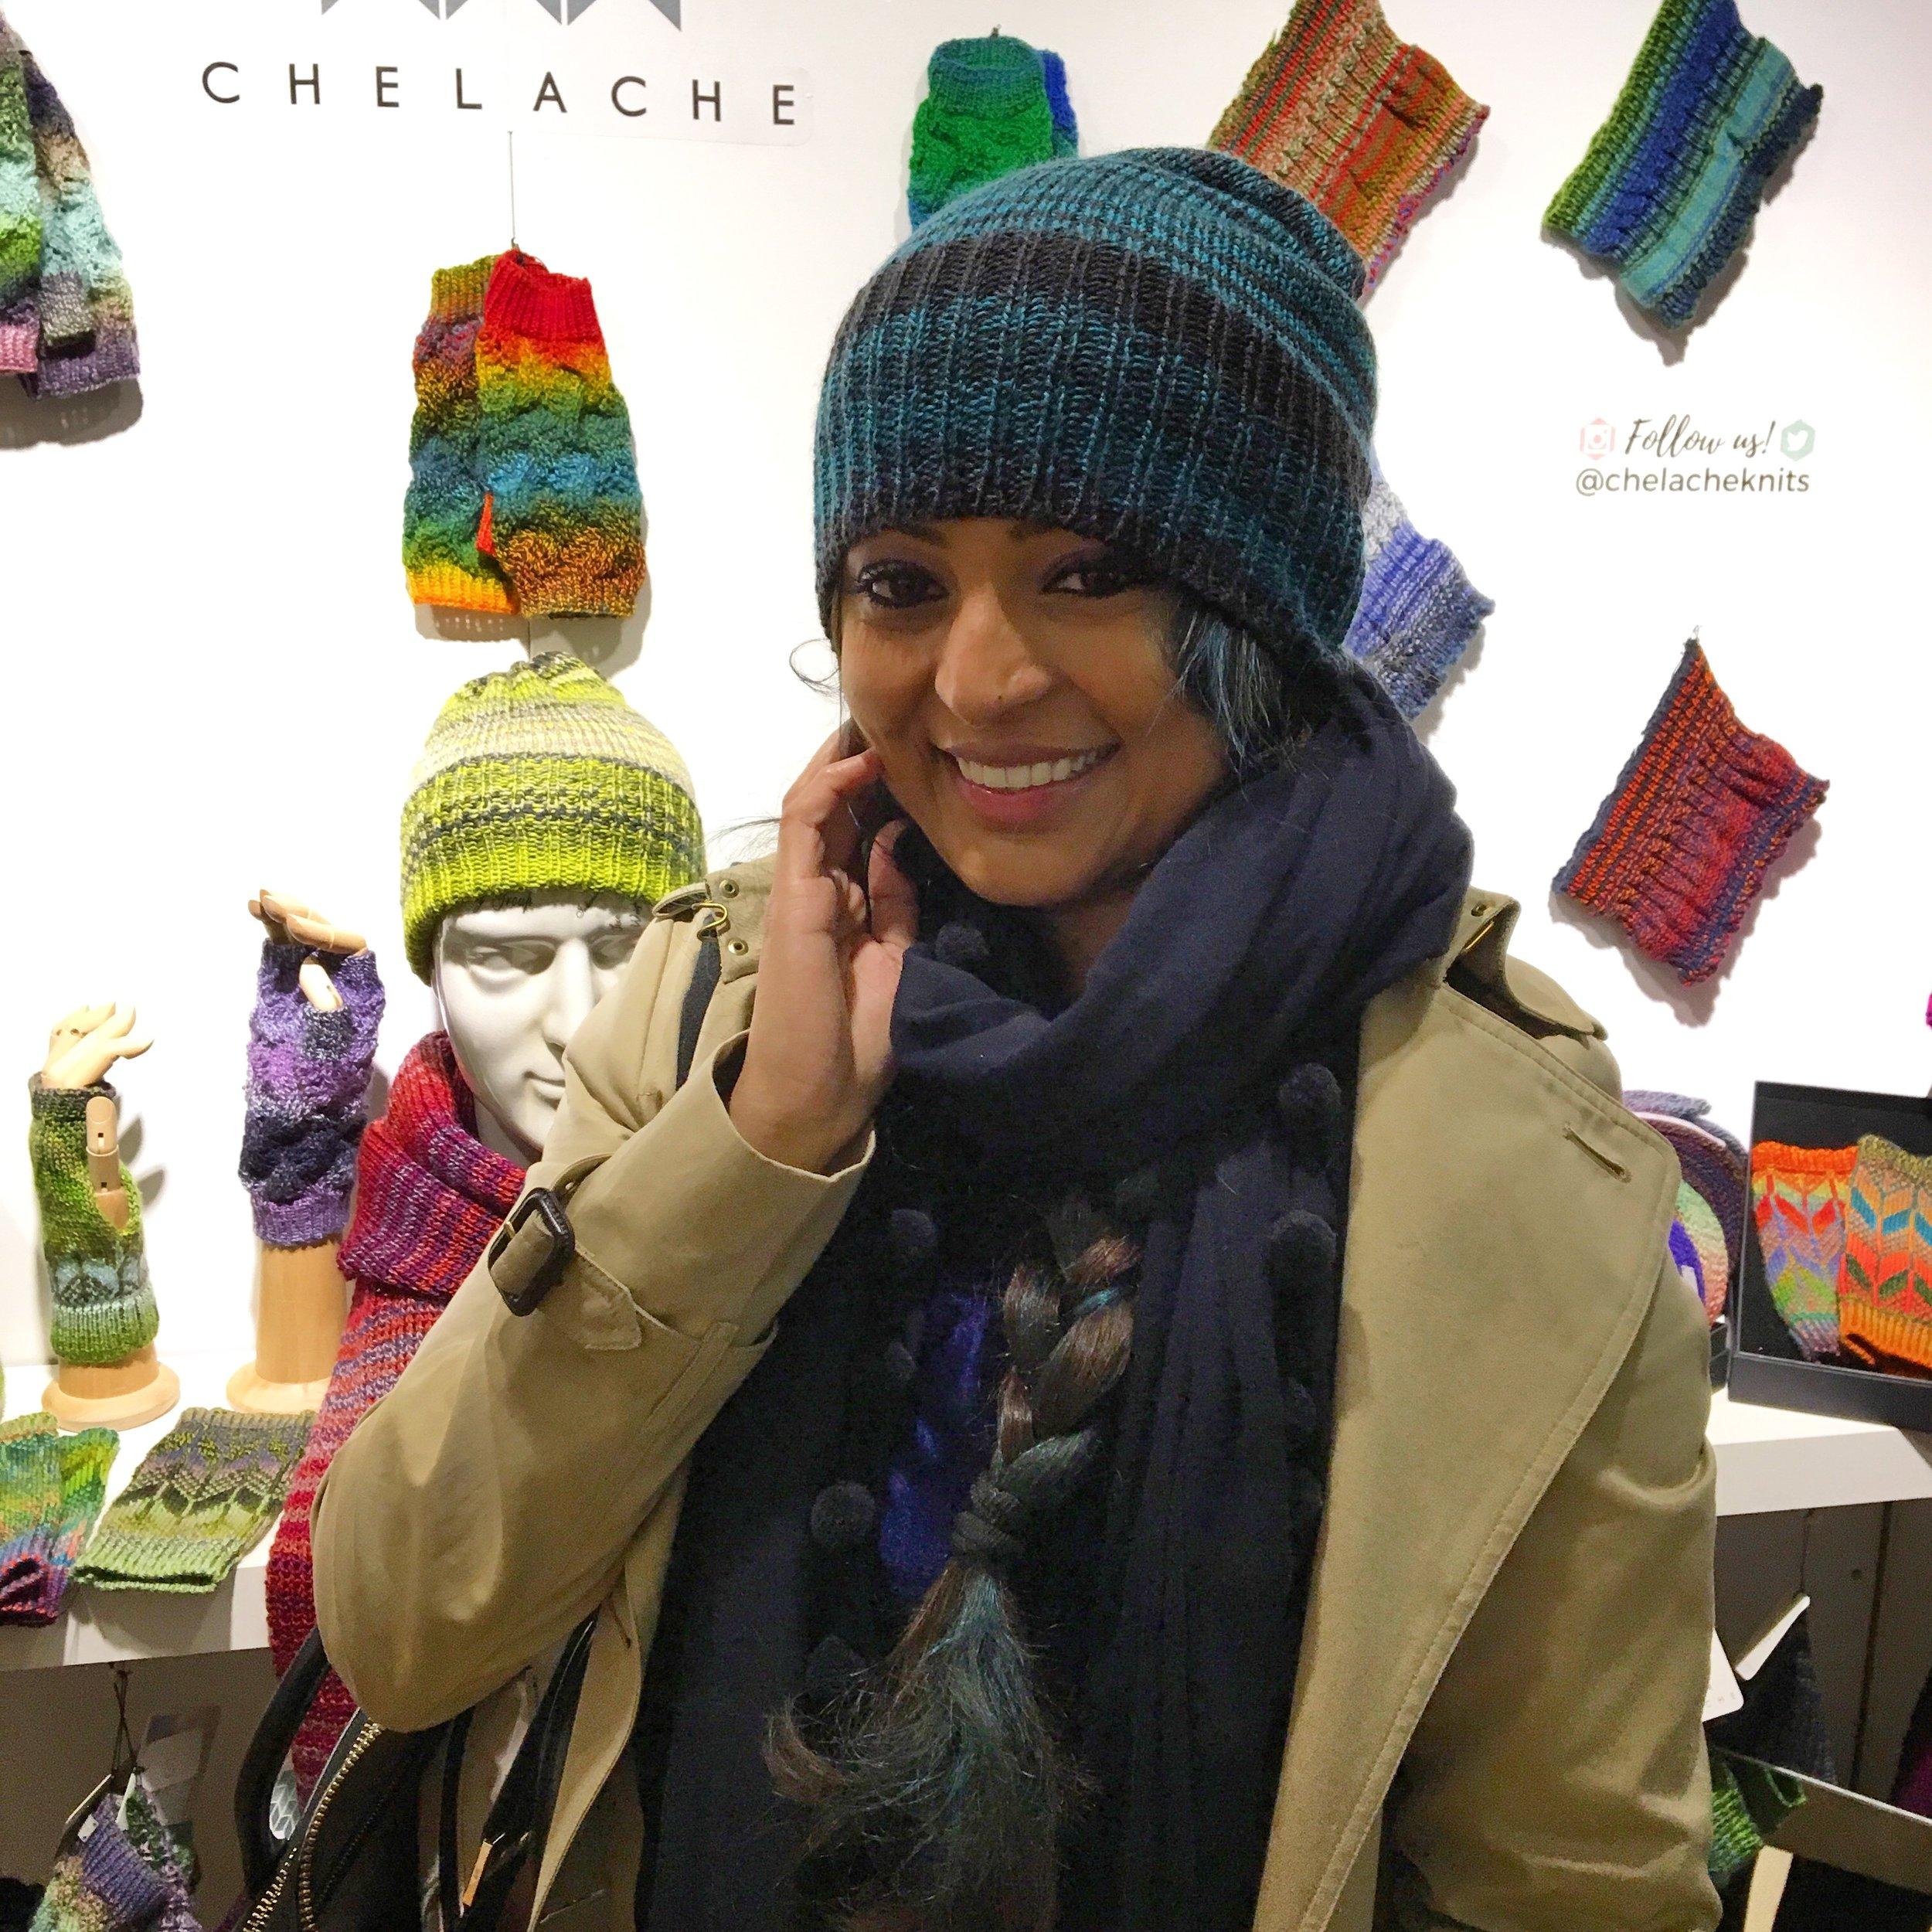 A happy customer wearing a CHELACHE beanie hat